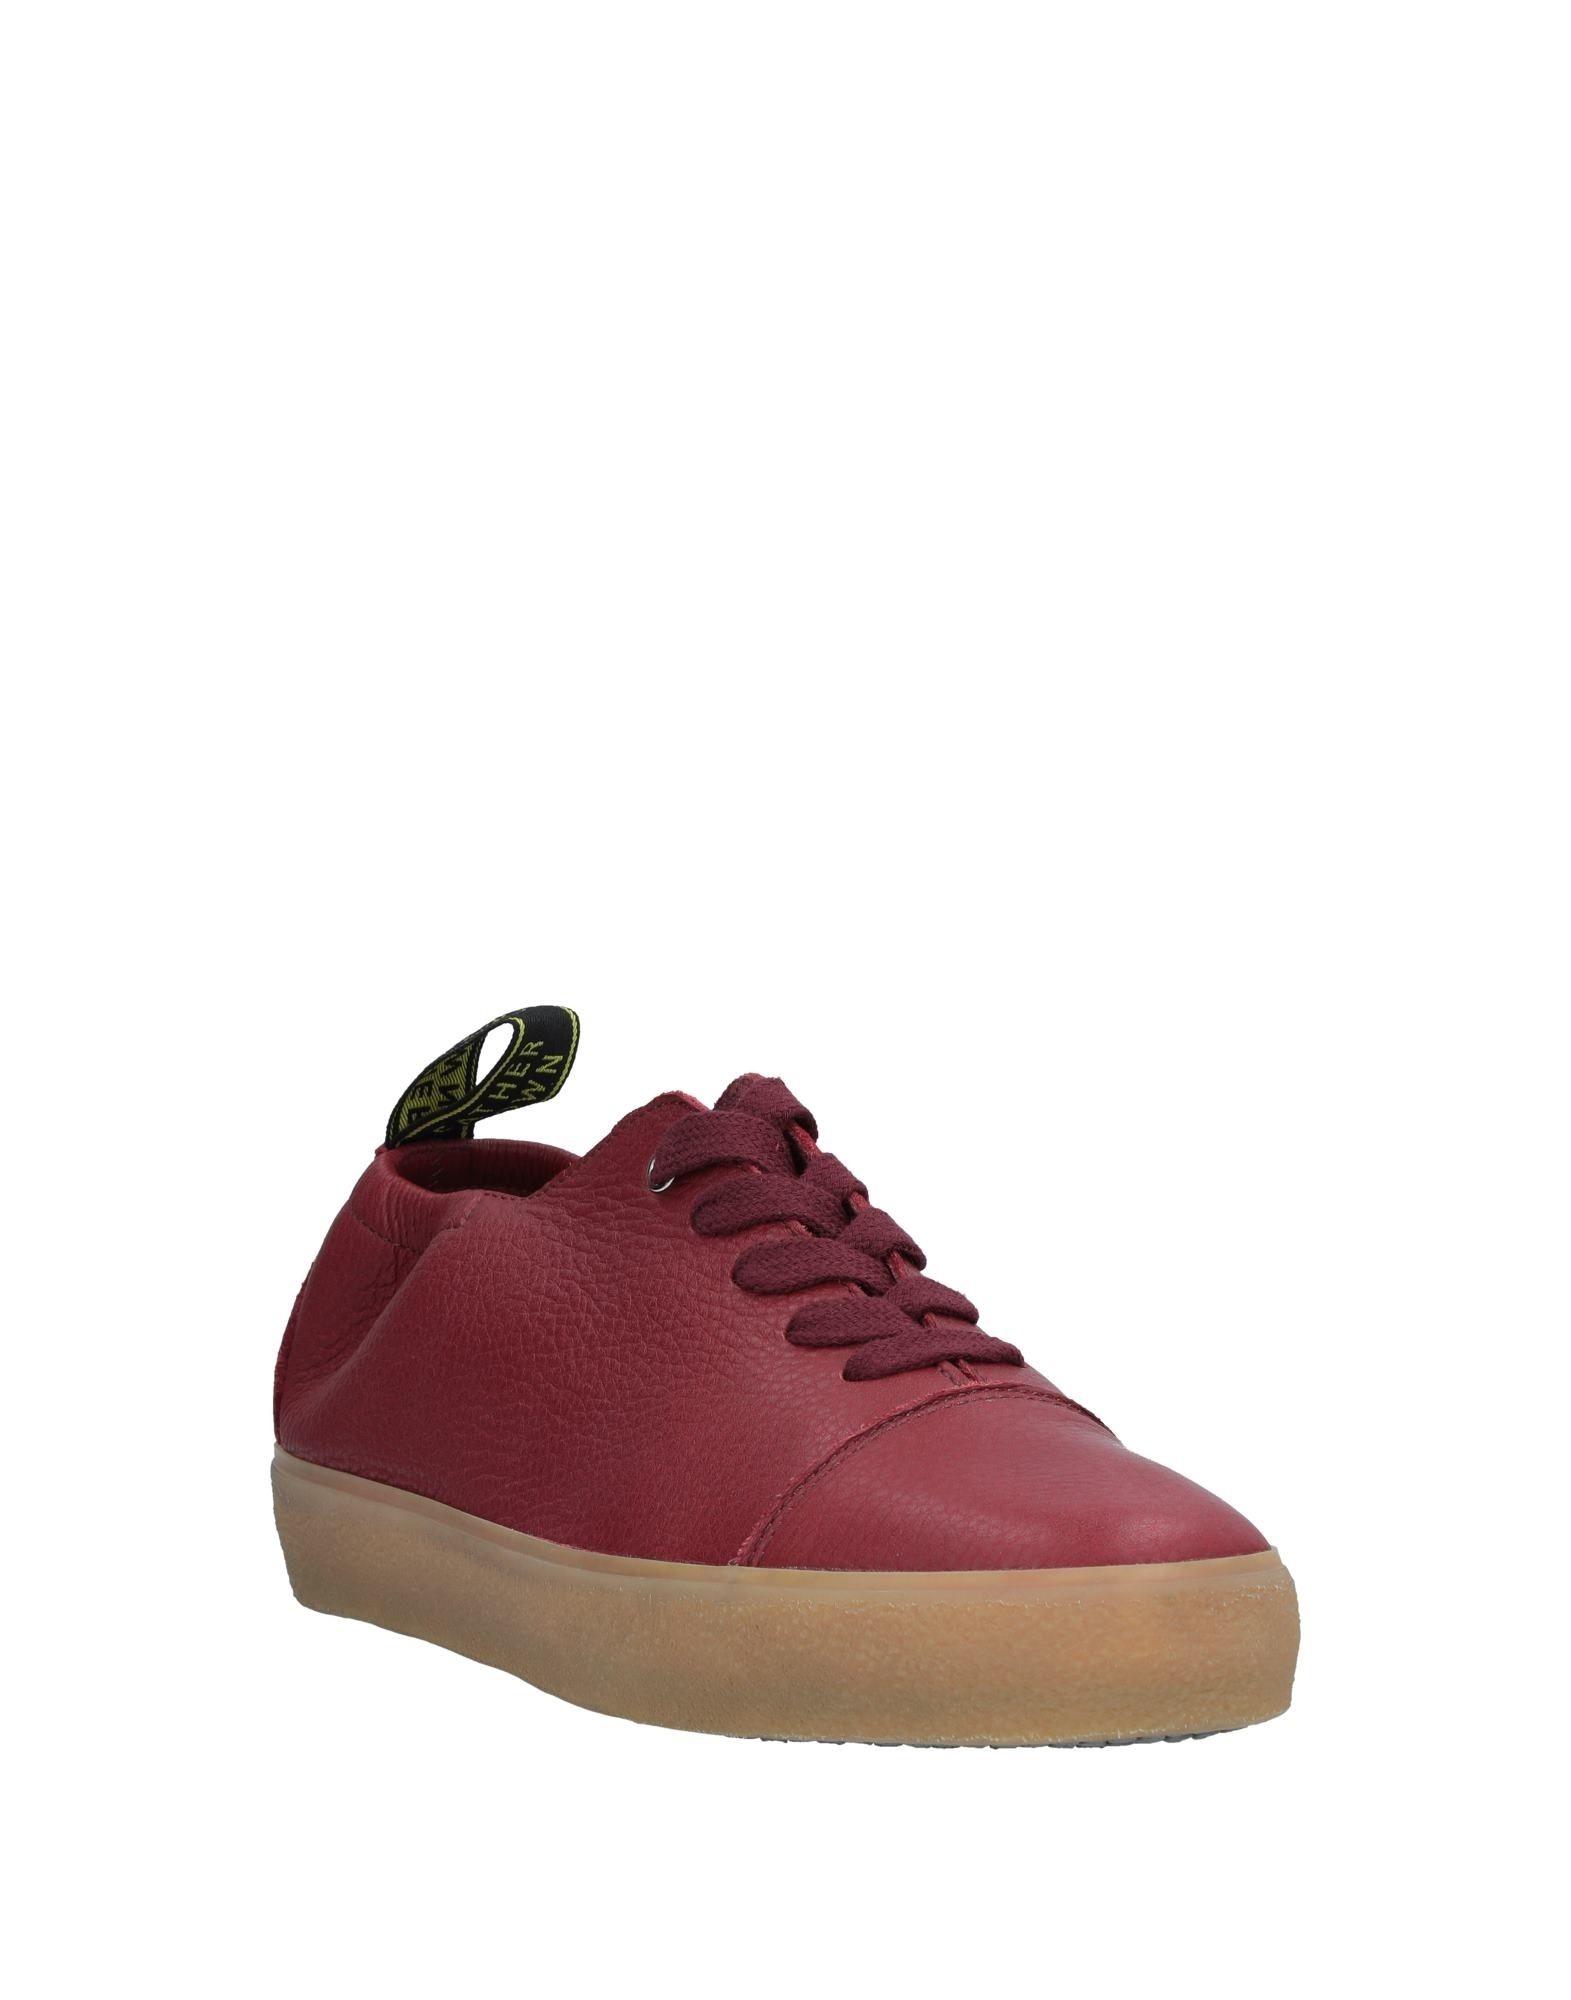 Rabatt echte Schuhe Leder Crown 11531746EI Sneakers Herren  11531746EI Crown 796207